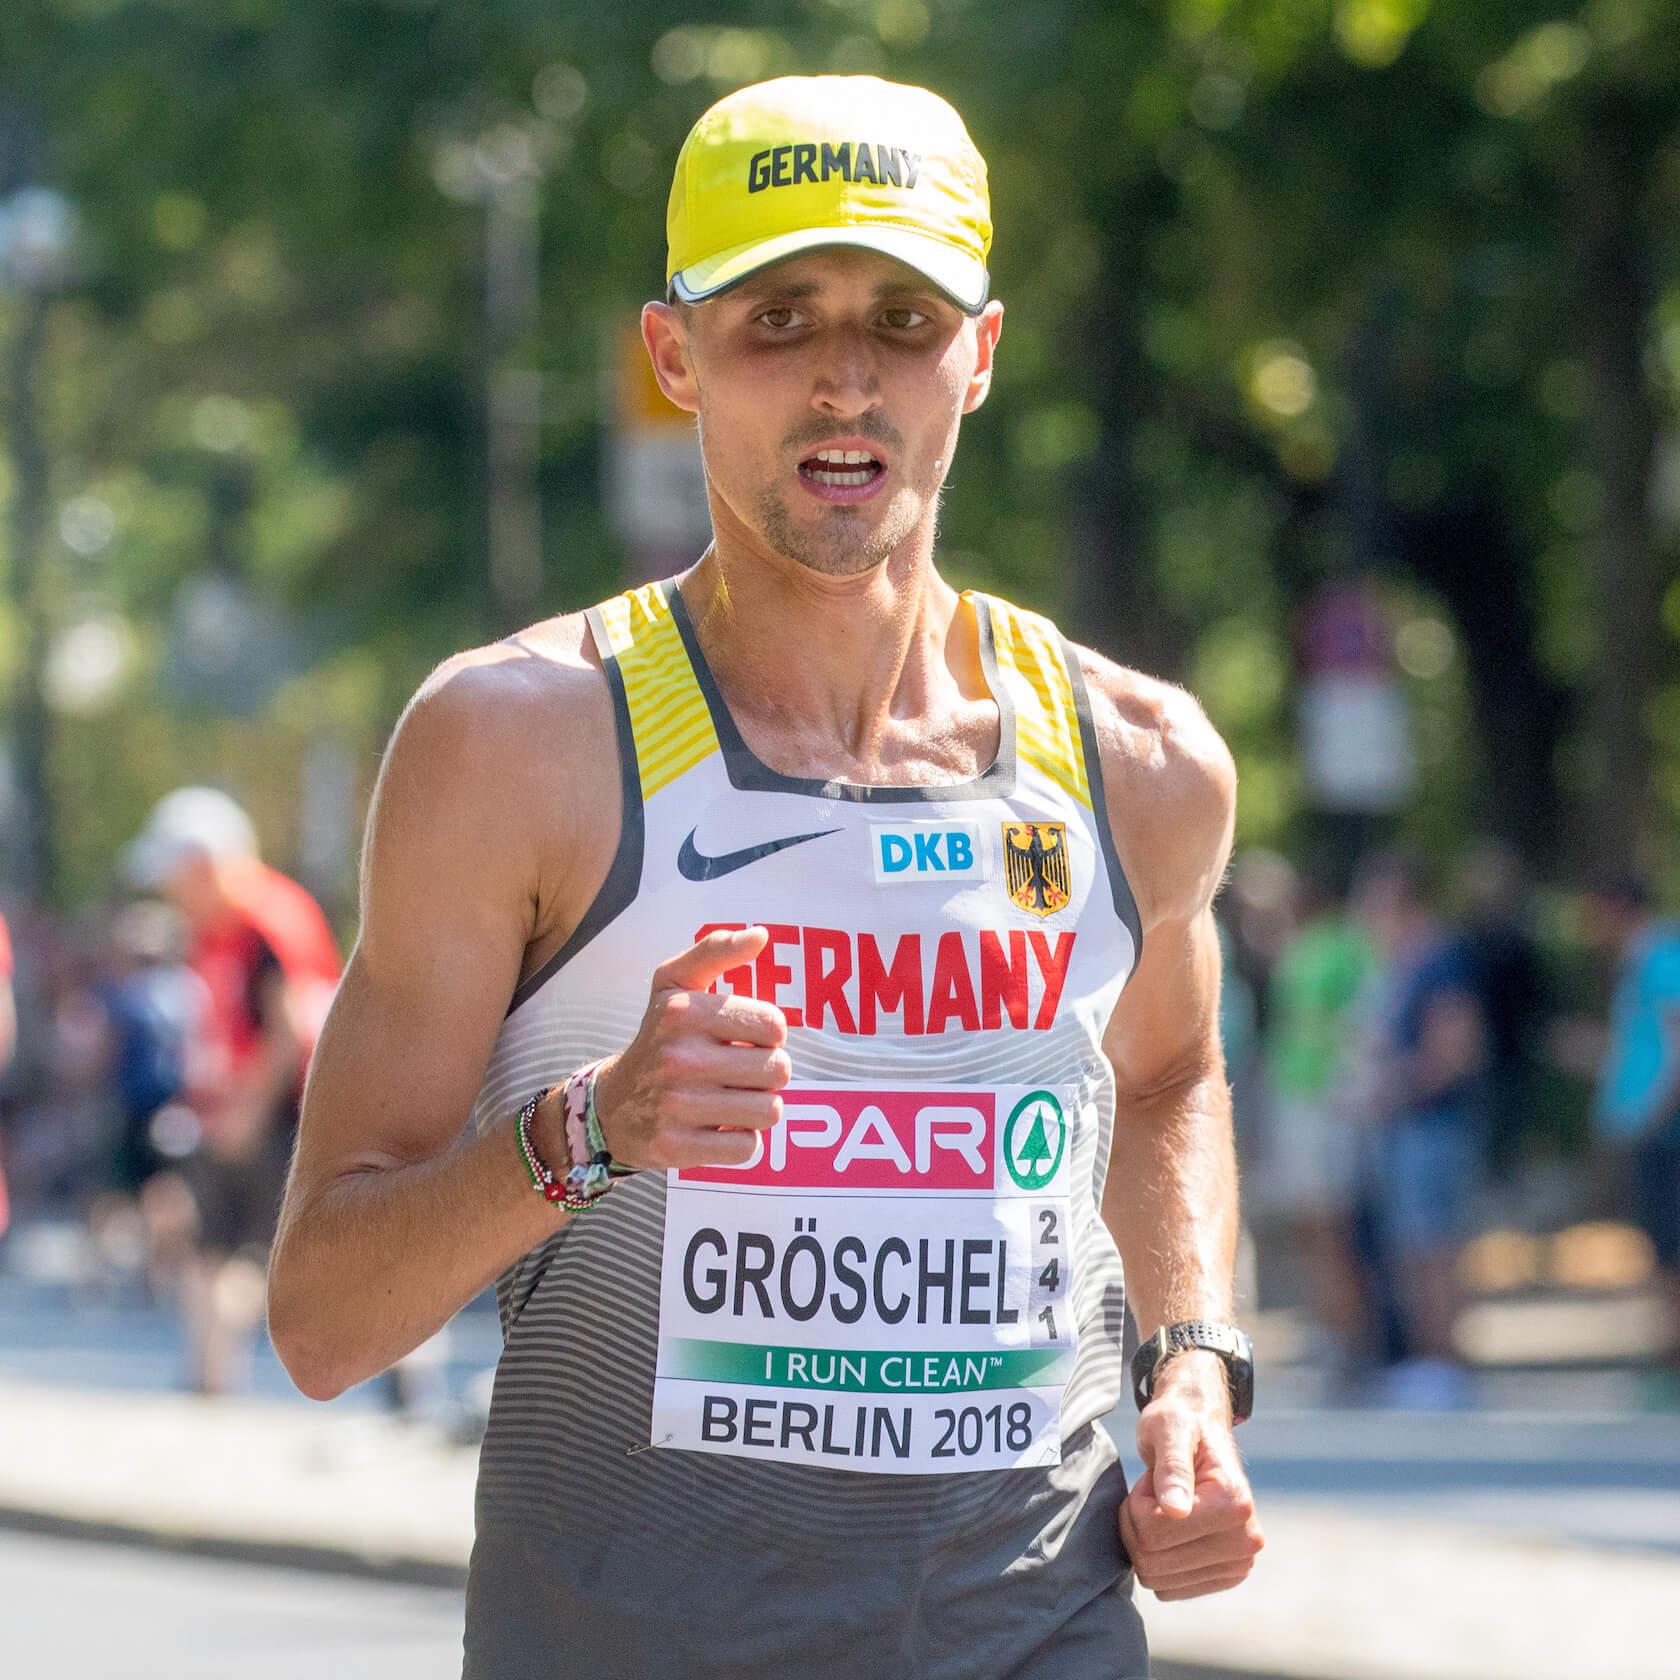 Tom Gröschel